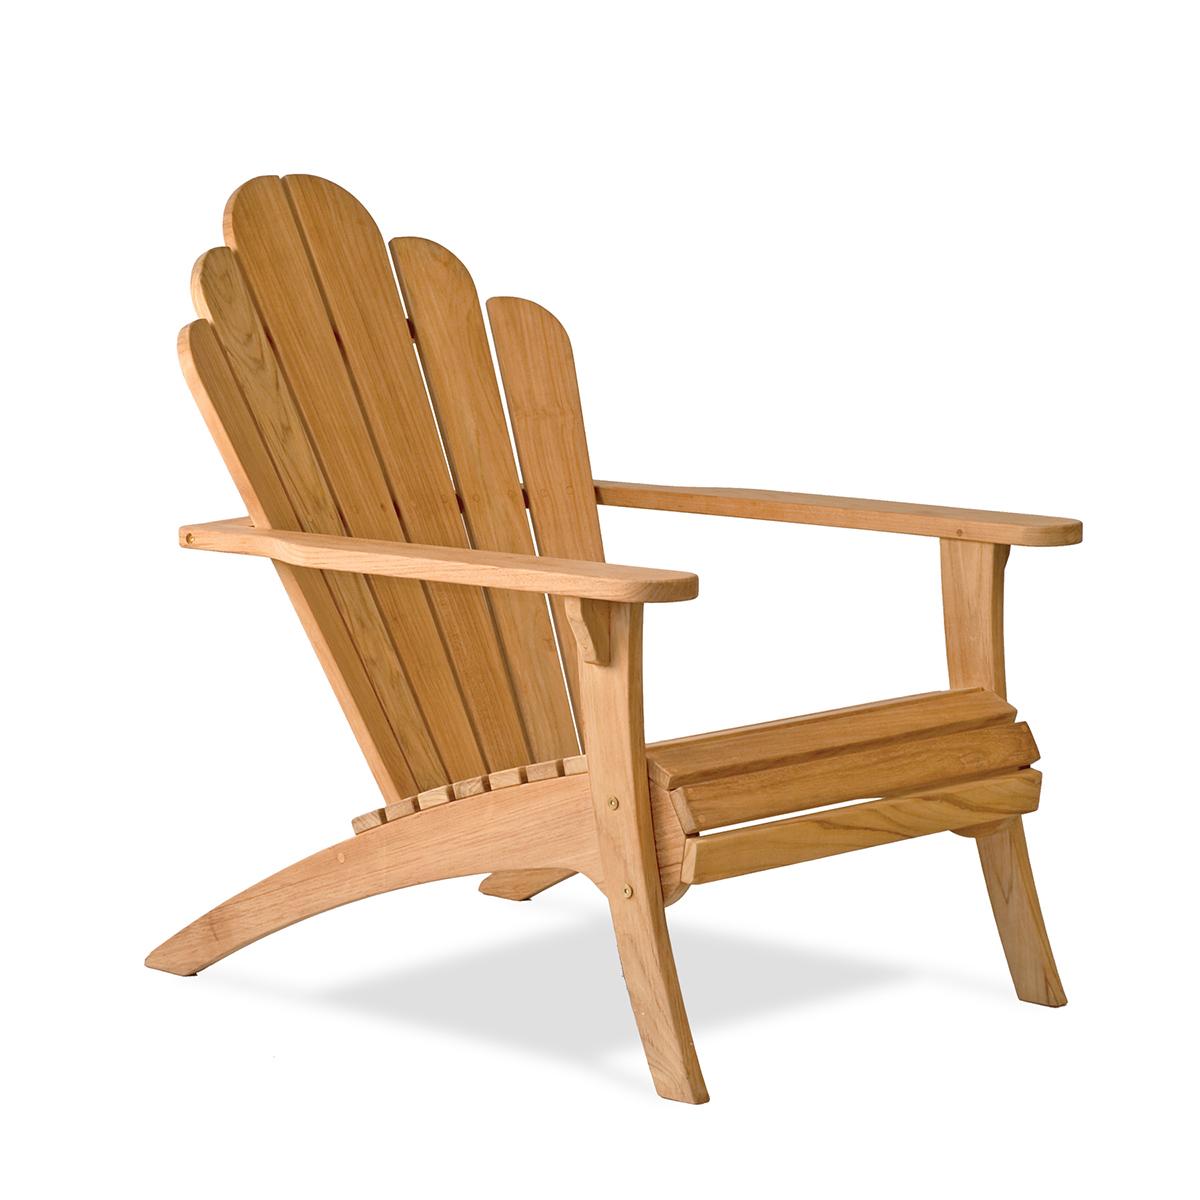 Adirondack chair made of high quality teak    classic design    Bainbridge Collection IXSBNXR